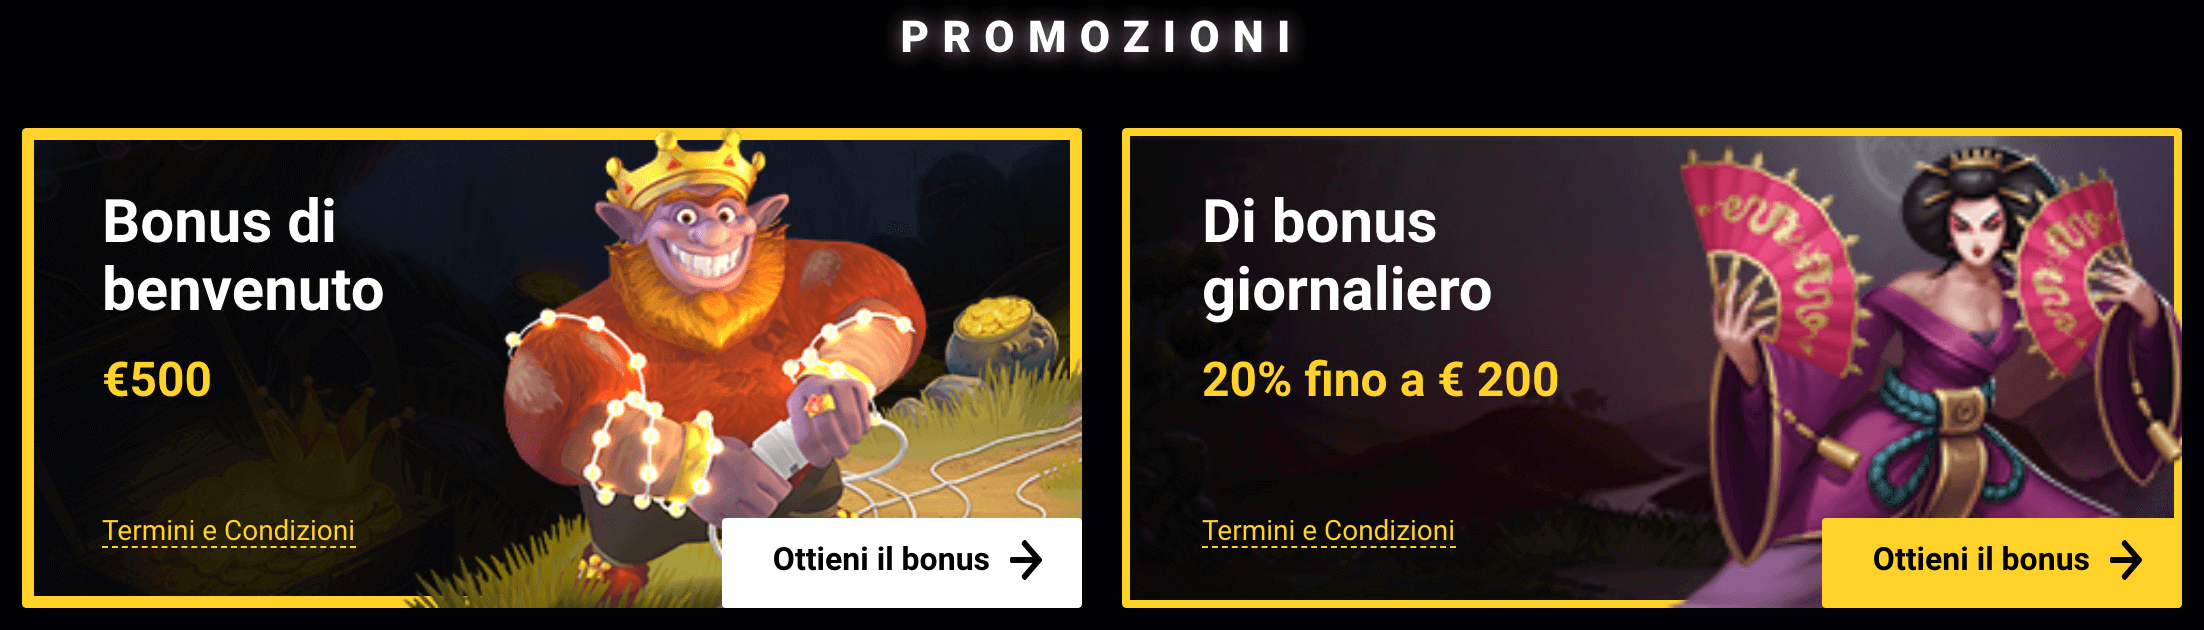 Promozioni Zet Casino